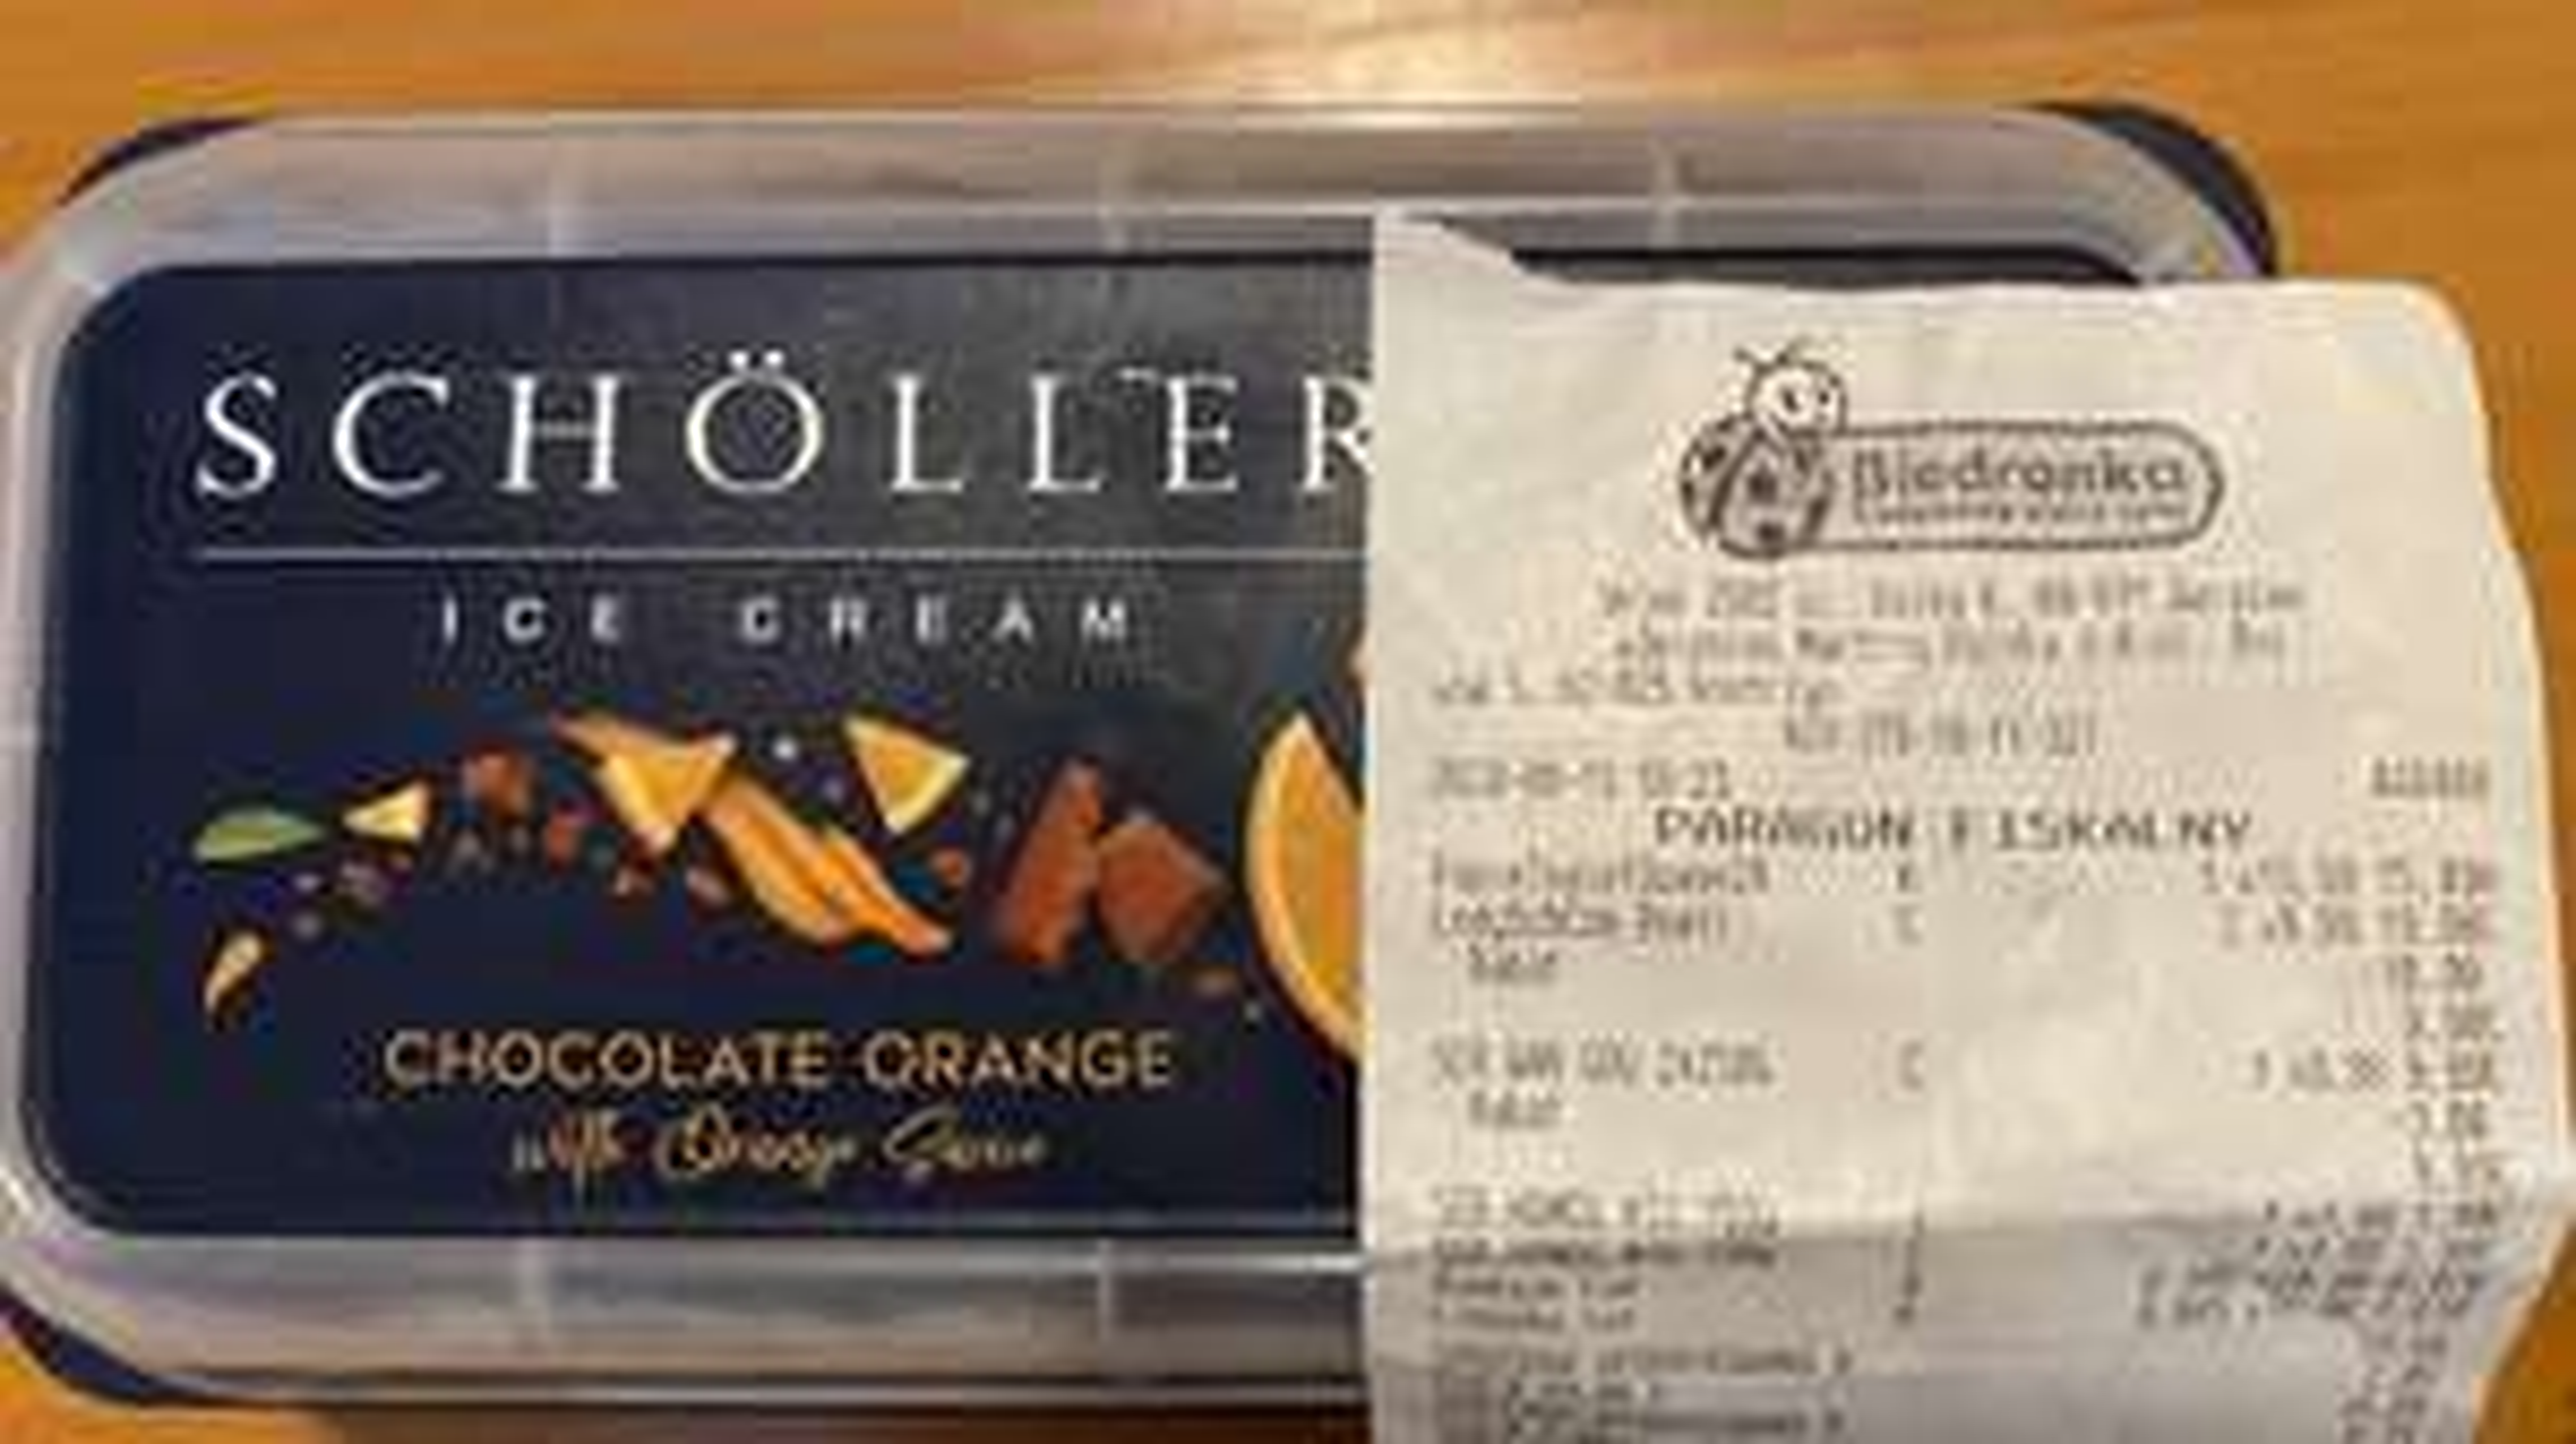 Lody Scholler Chocolate Orange 1L BIEDRONKA